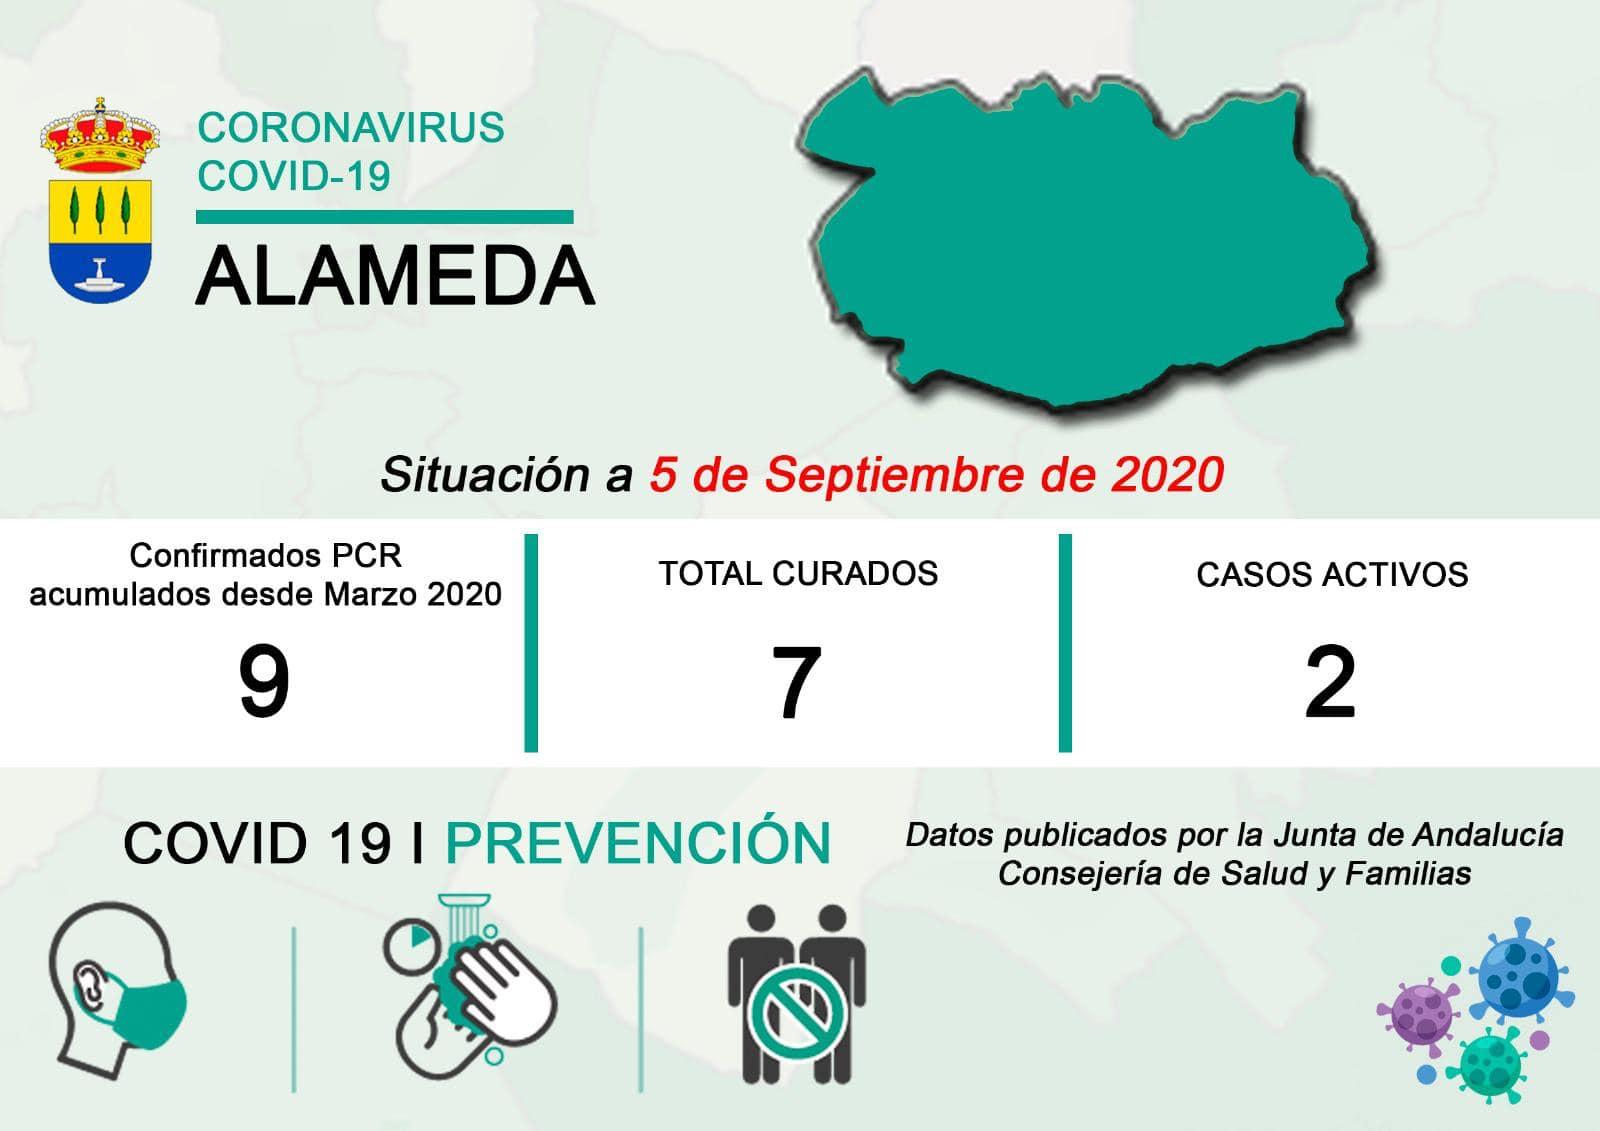 Dos casos activos de COVID-19 (septiembre 2020) - Alameda (Málaga)